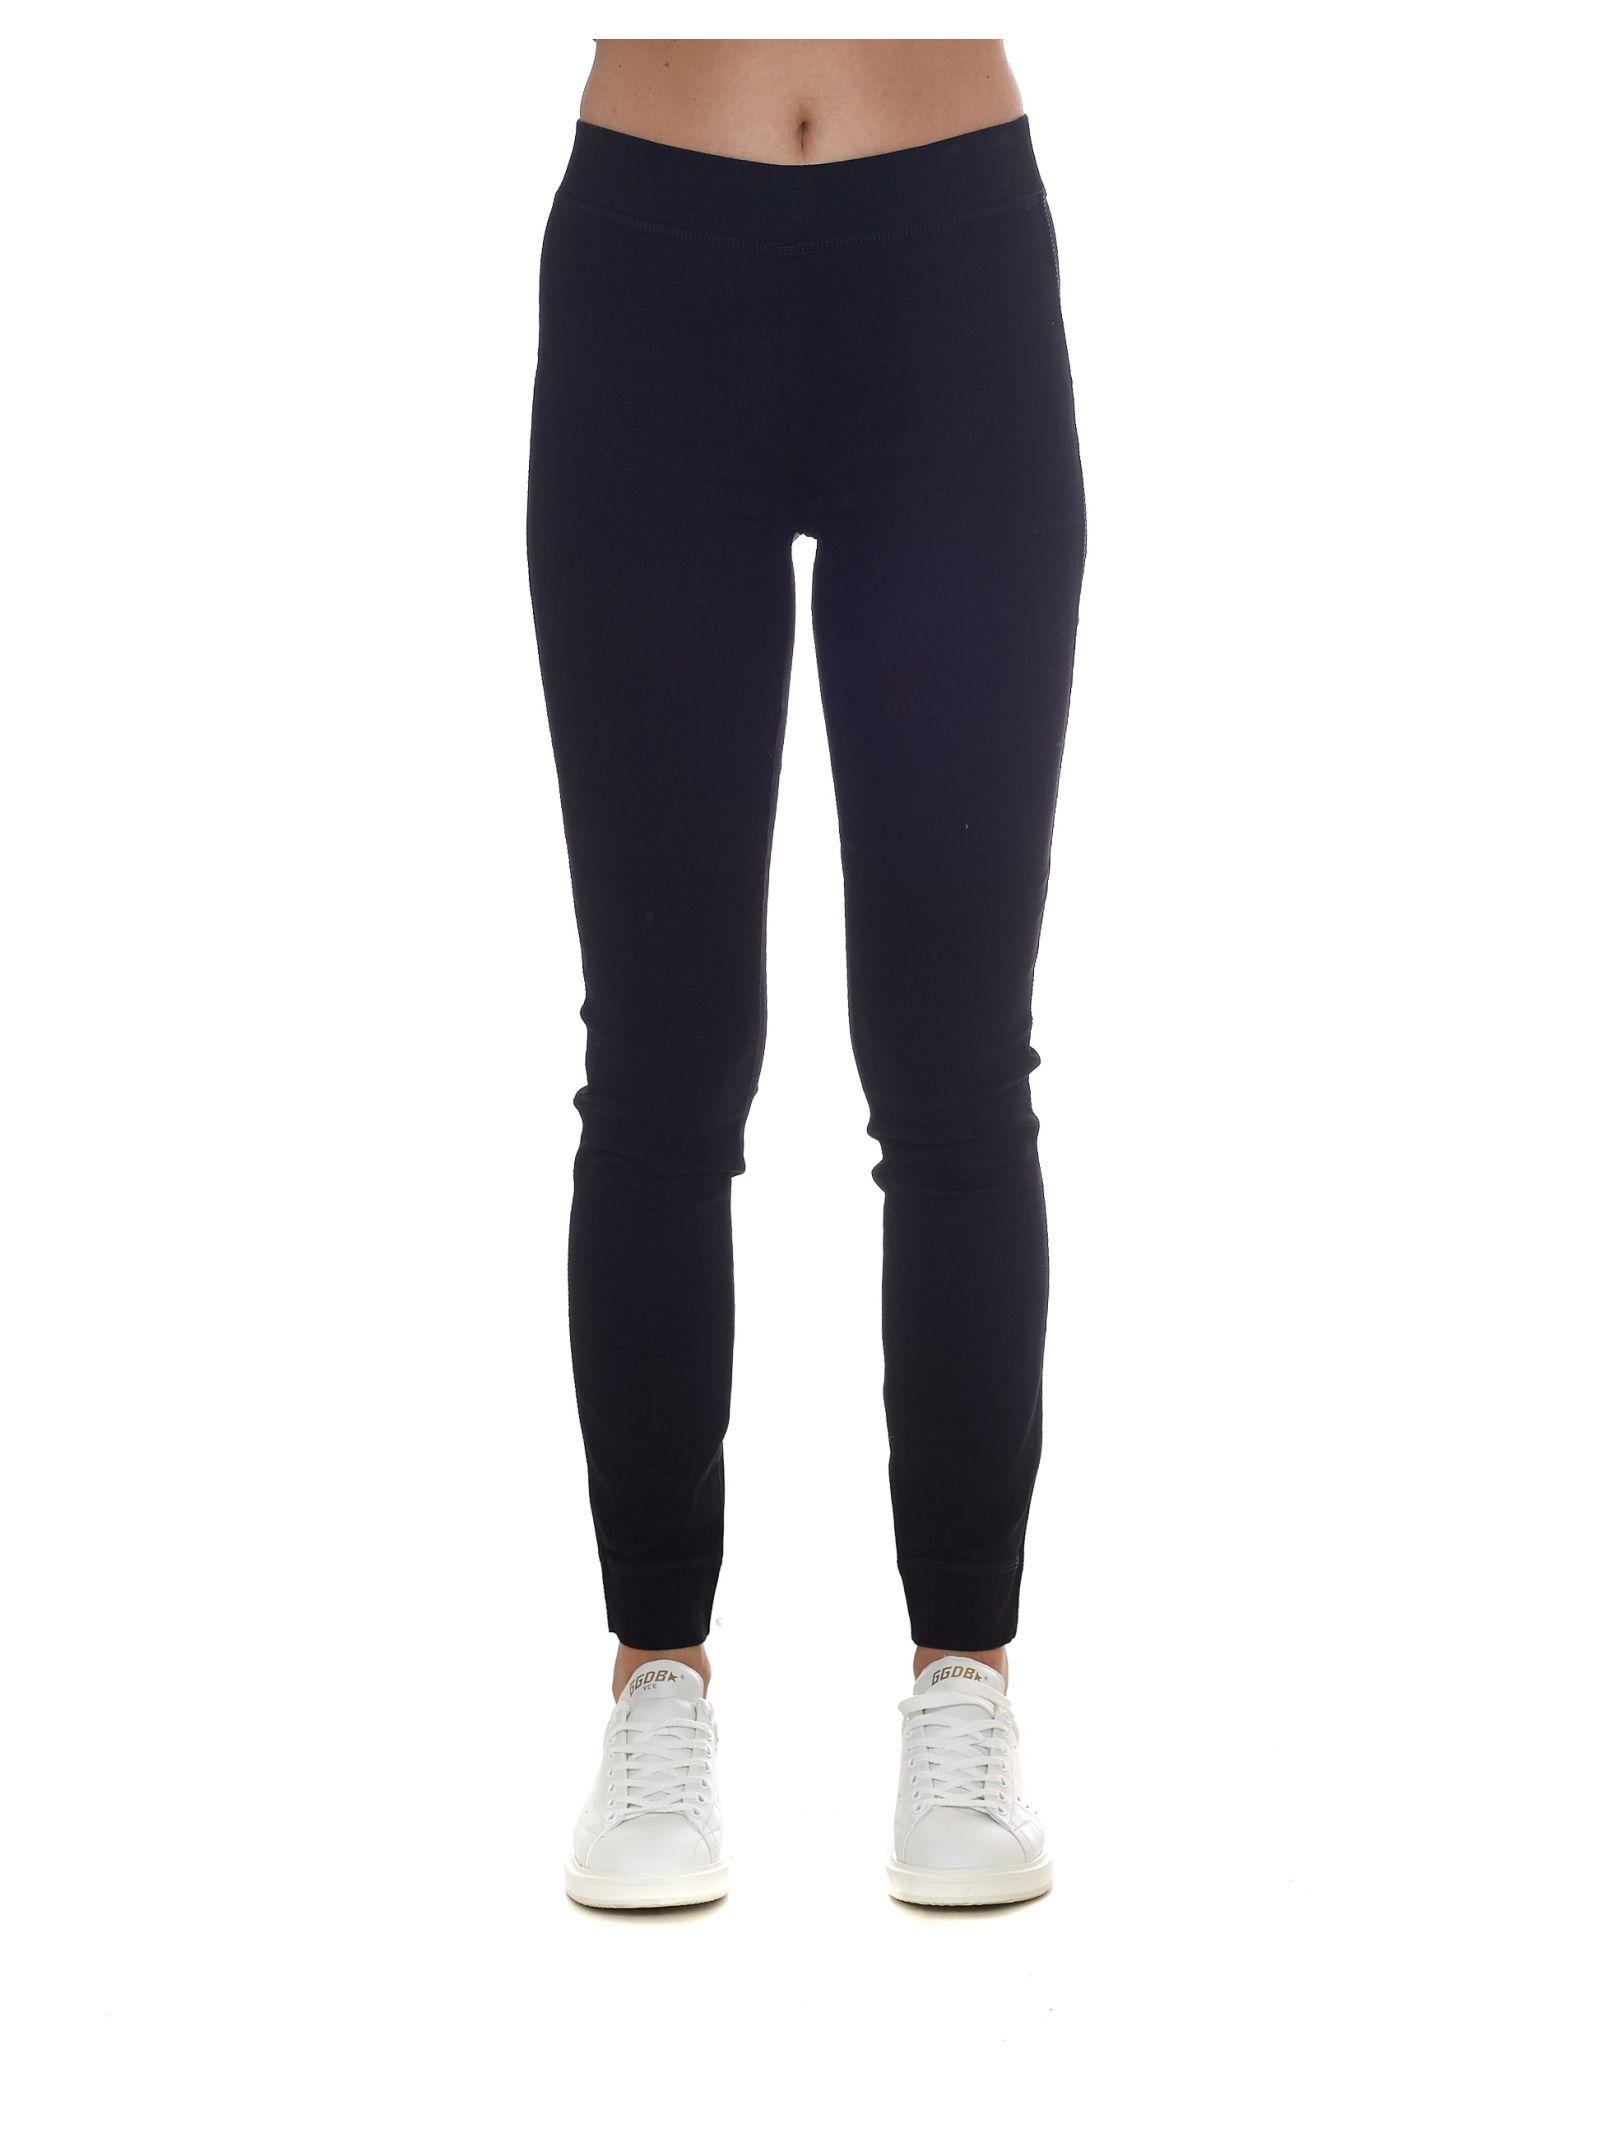 Pantaloni trening de damă Briana Trainers by TORY BURCH